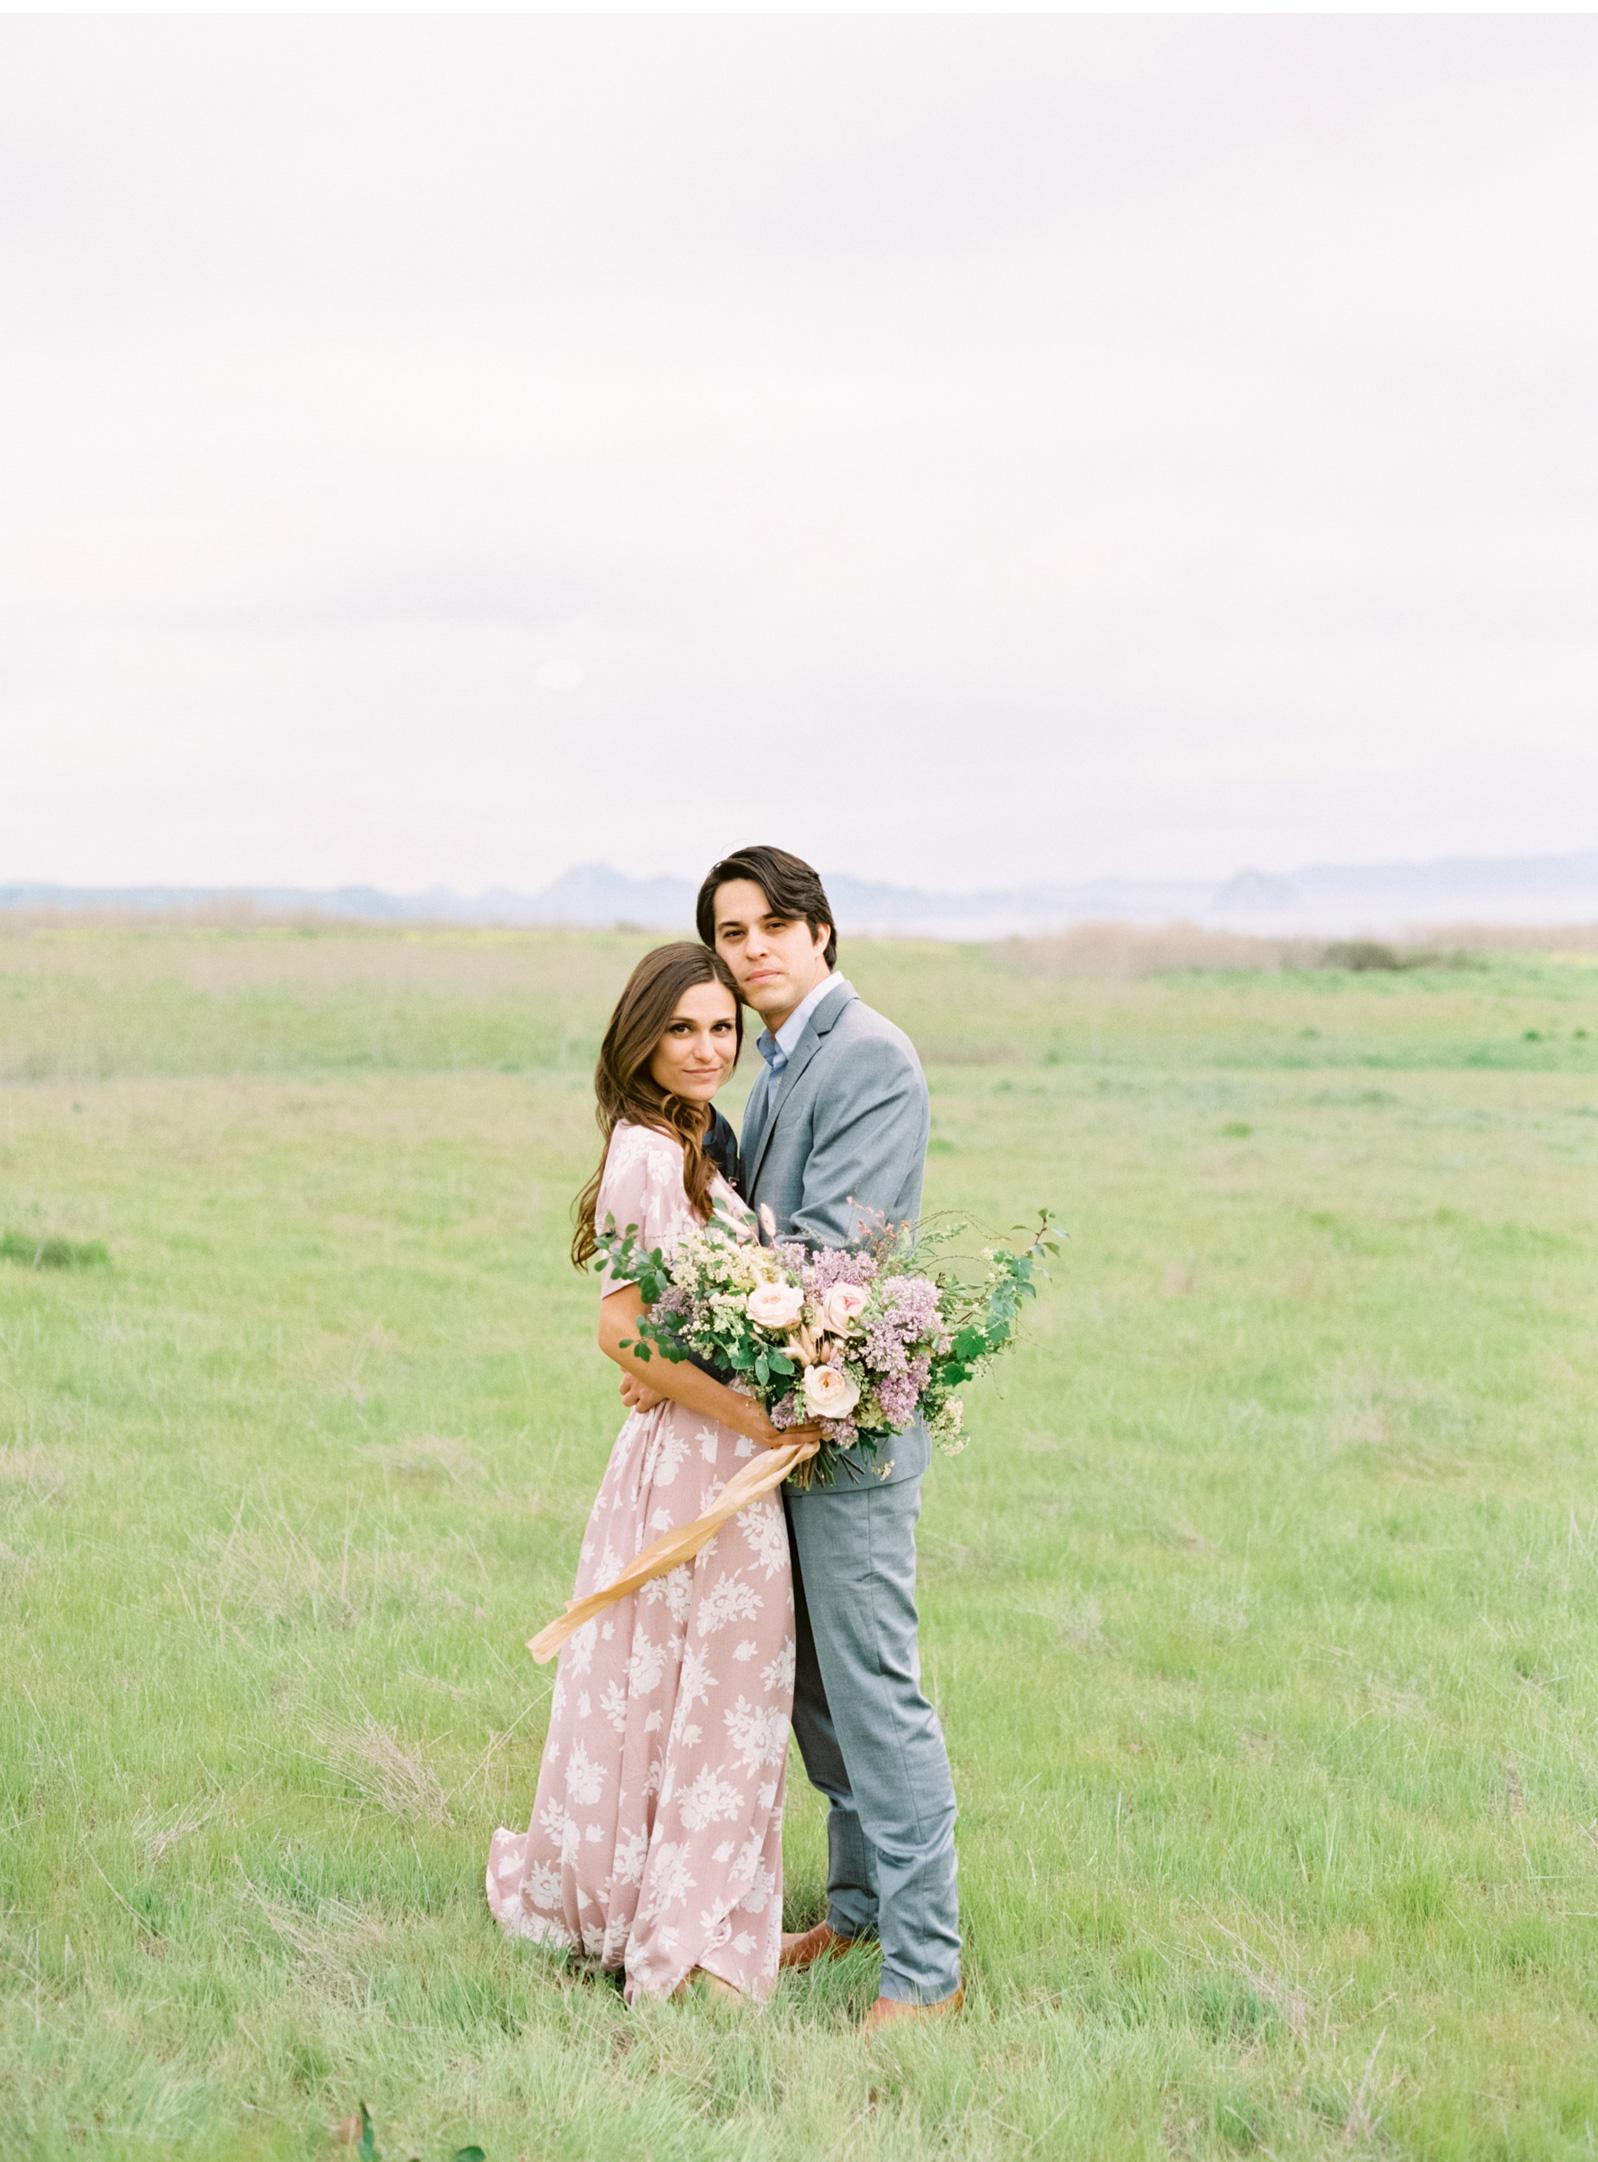 Saddlerock-Ranch-Malibu-Wedding-Natalie-Schutt-Photography-Romantic-Florals-Rolling-Hills-Engagement_02.jpg